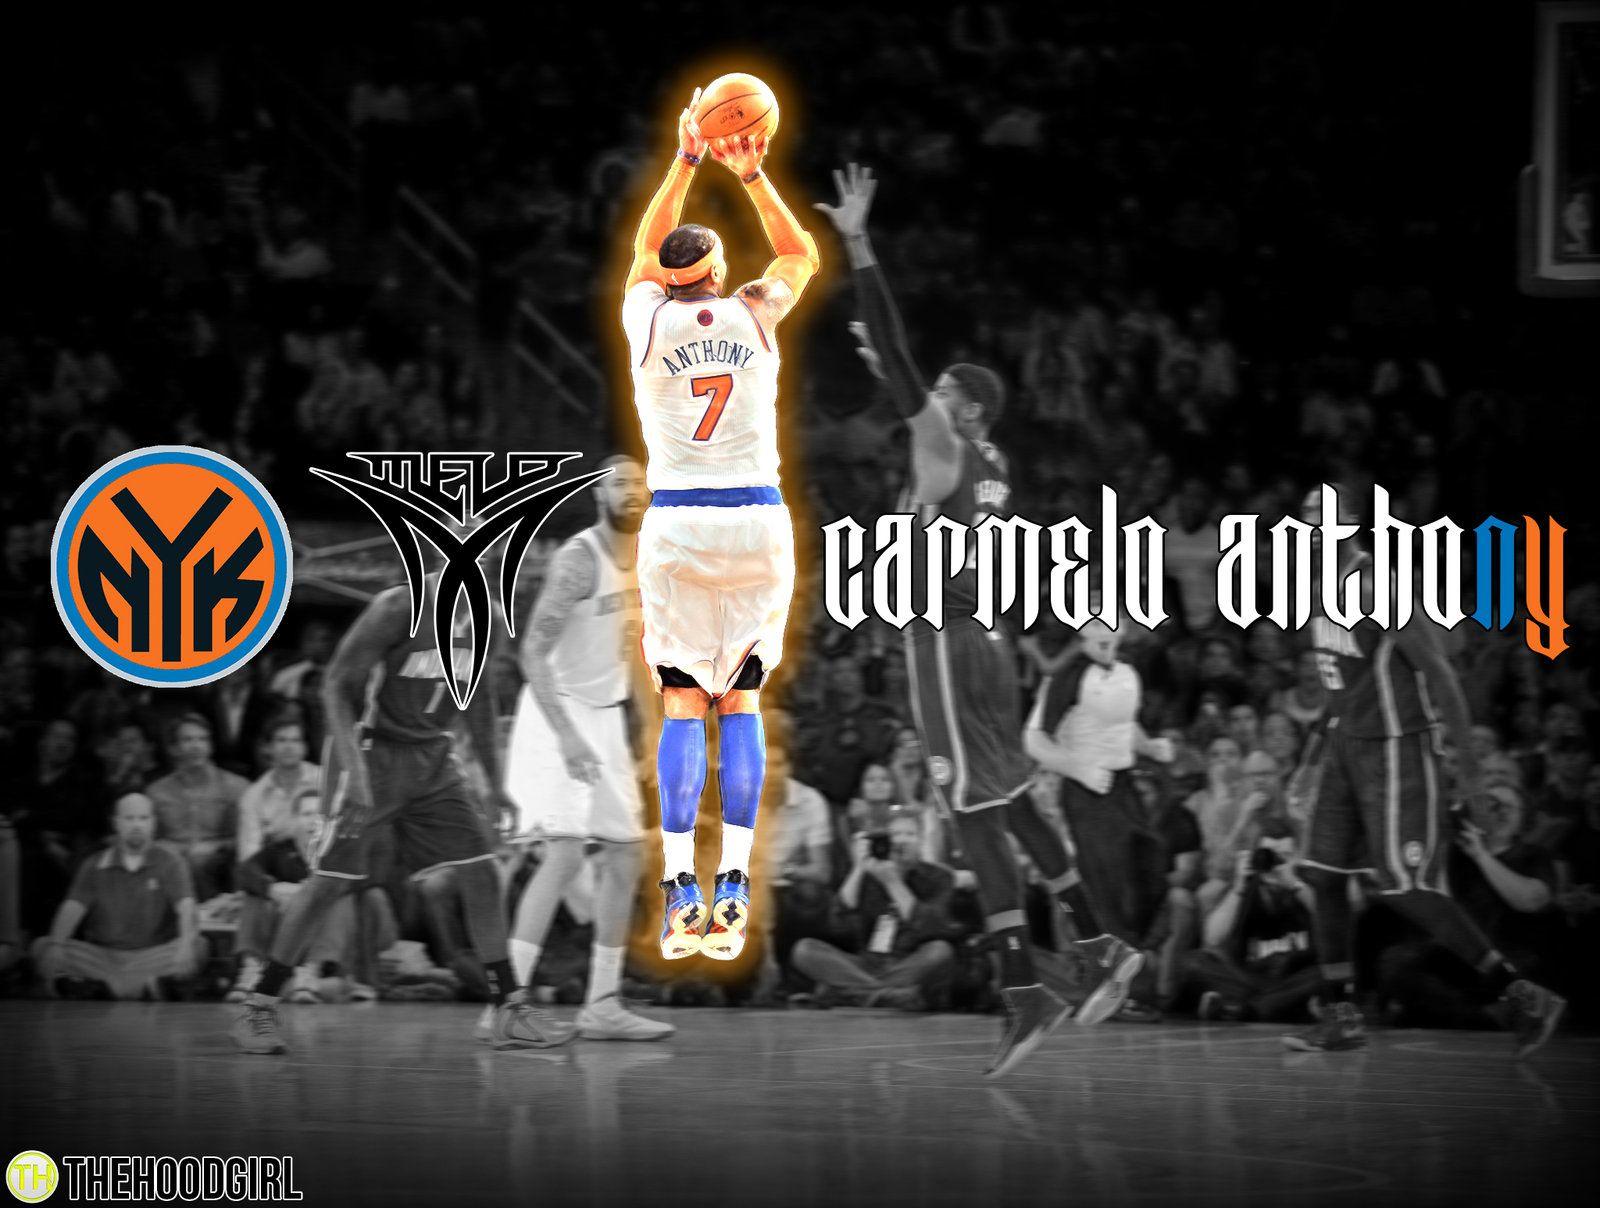 Carmelo Anthony Wallpaper 2015 Hd - WallpaperSafari